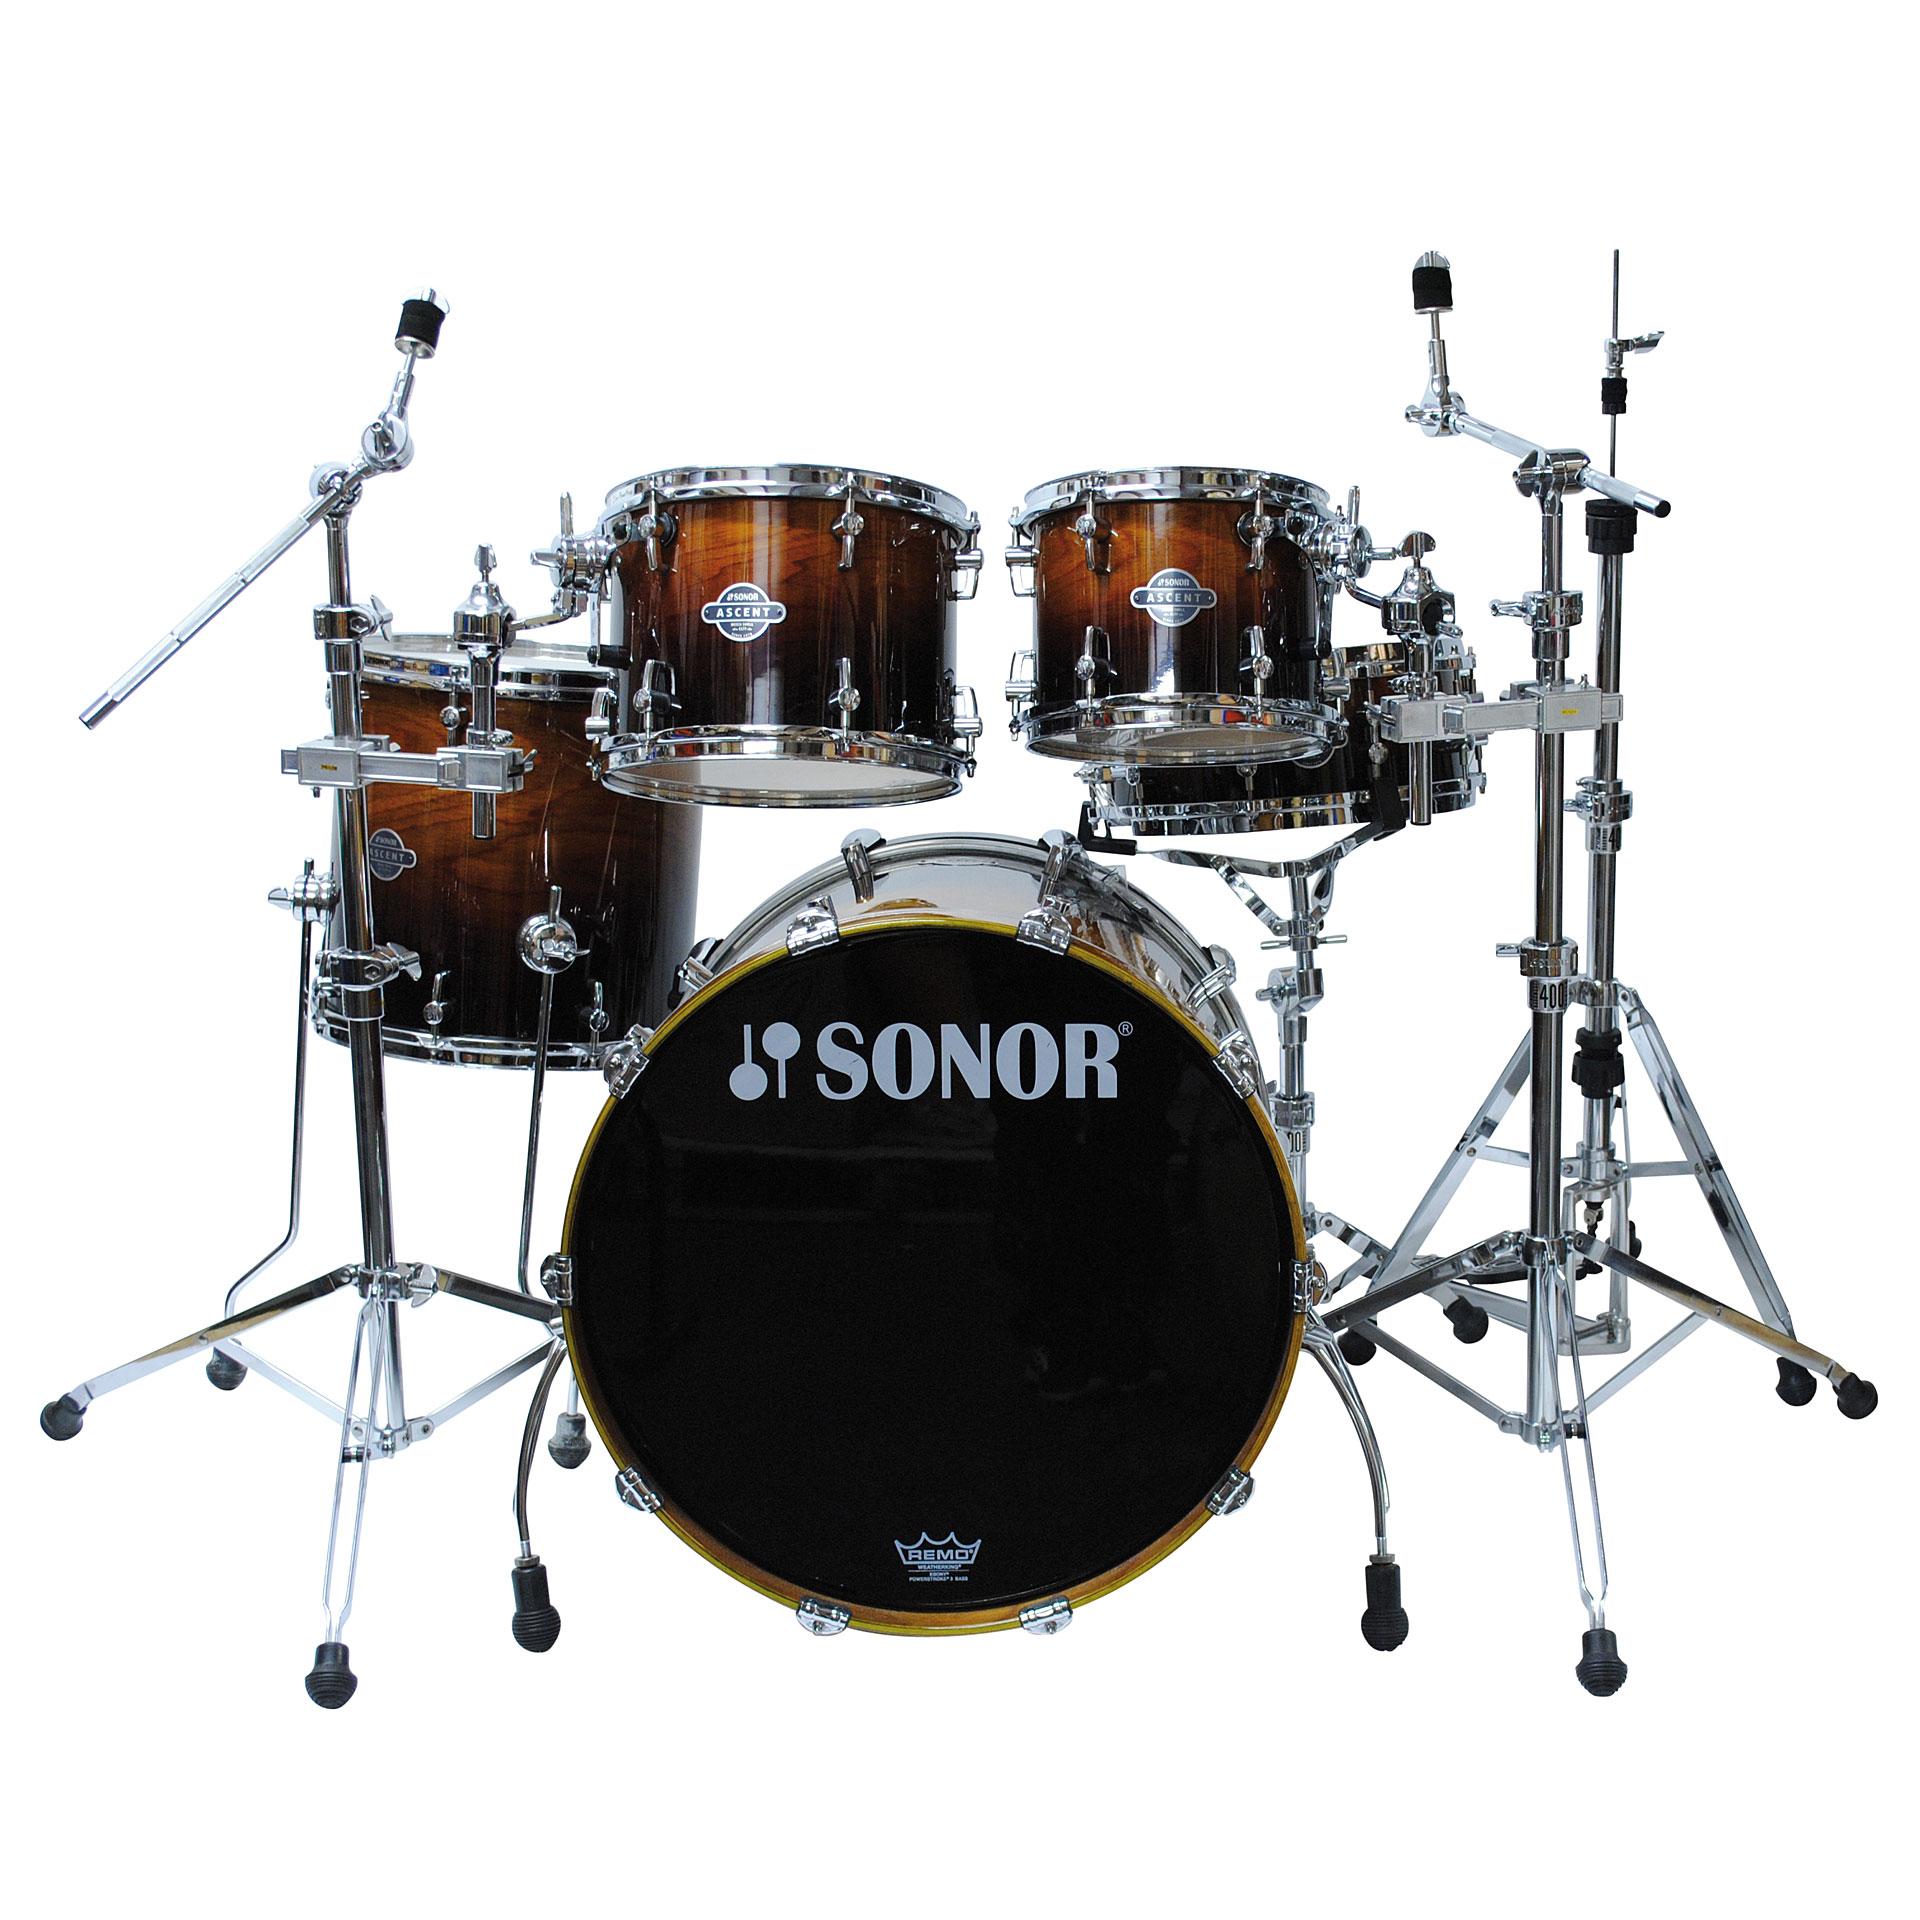 Sonor Ascent Asc11 Studio 10049847 171 Drum Kit